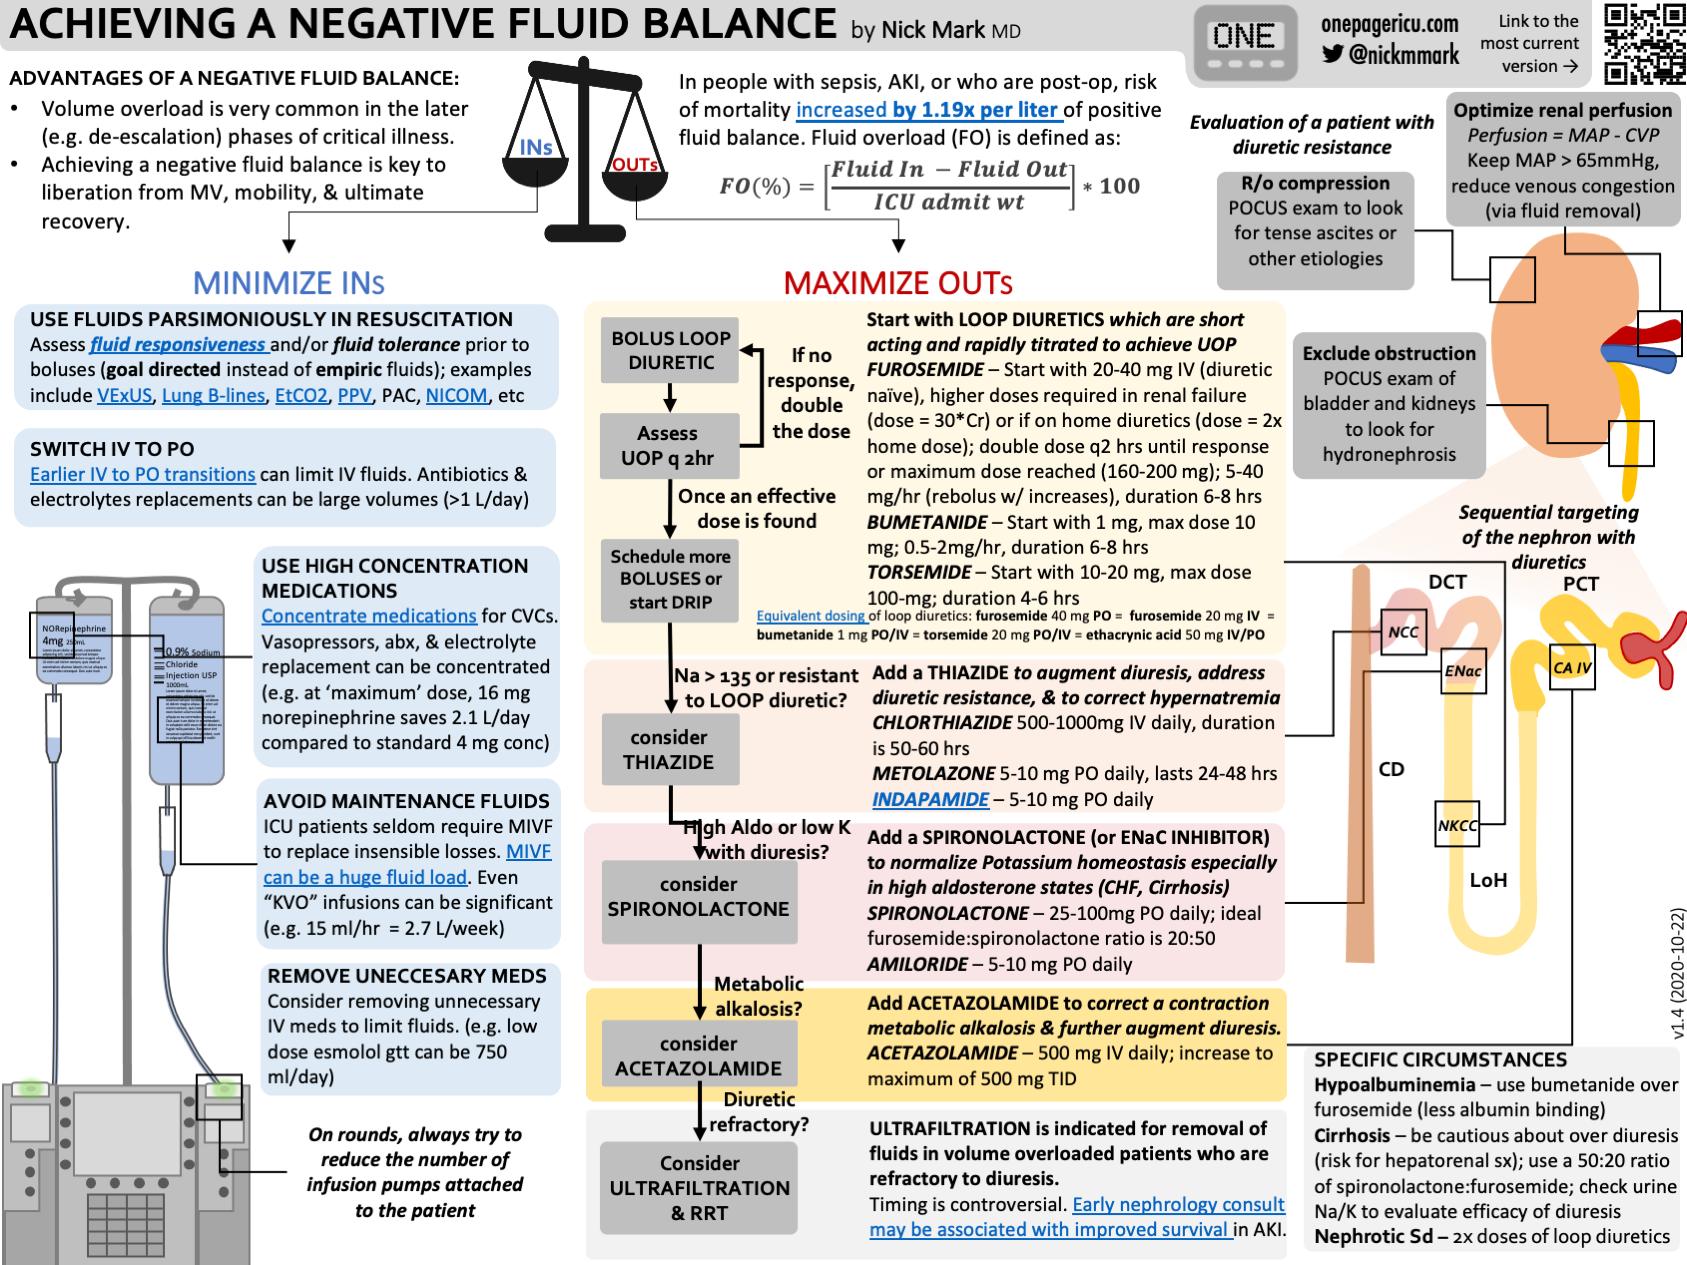 Negative fluid balance